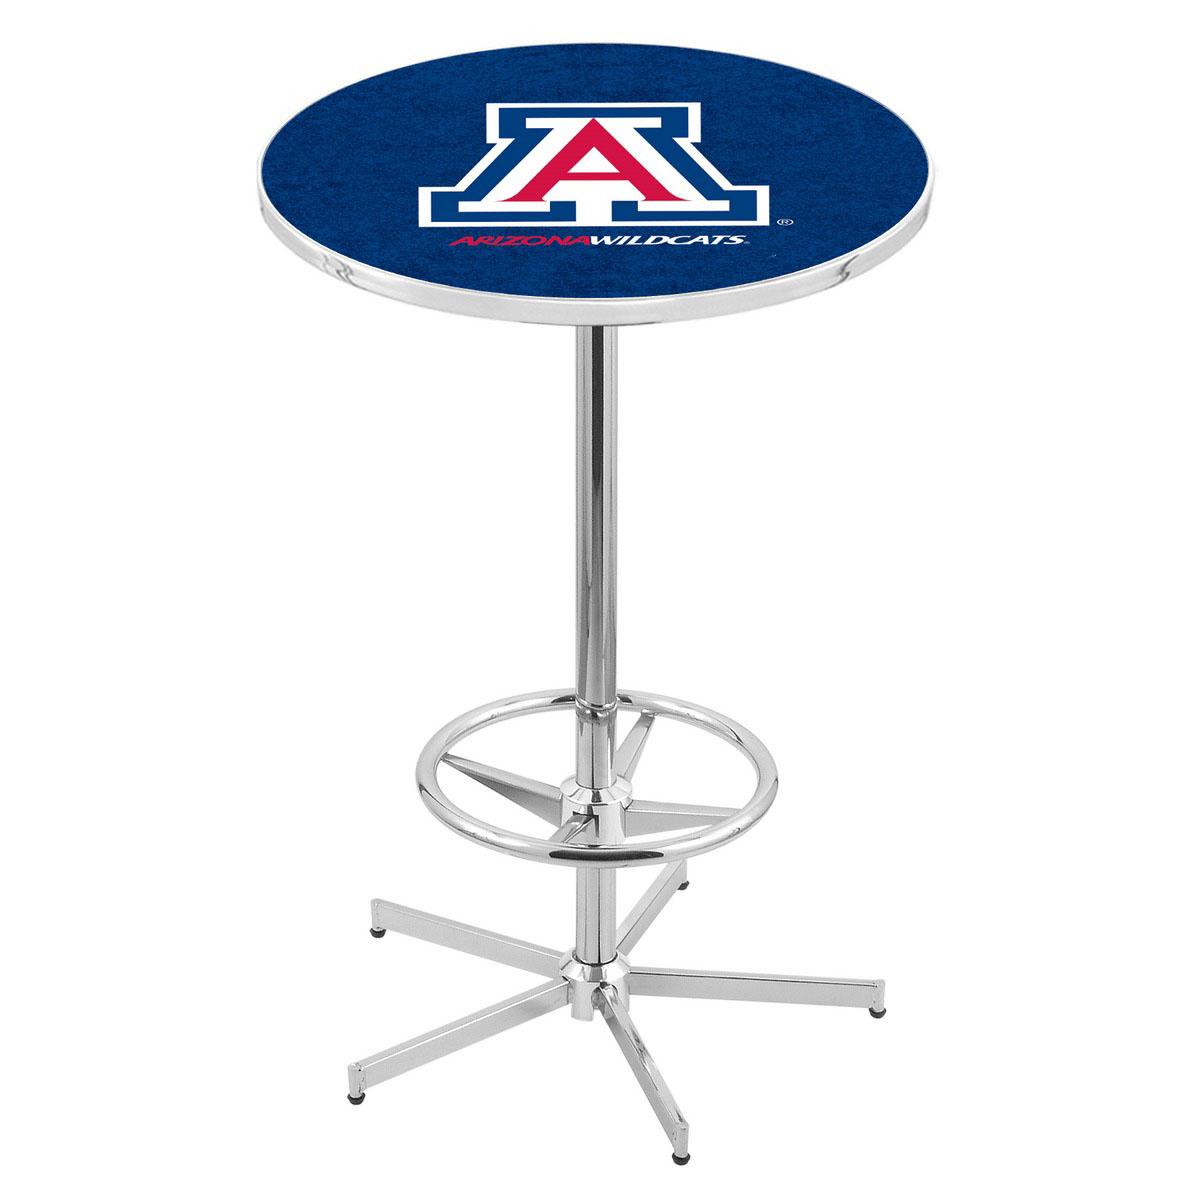 Search Chrome Arizona Pub Table Product Photo